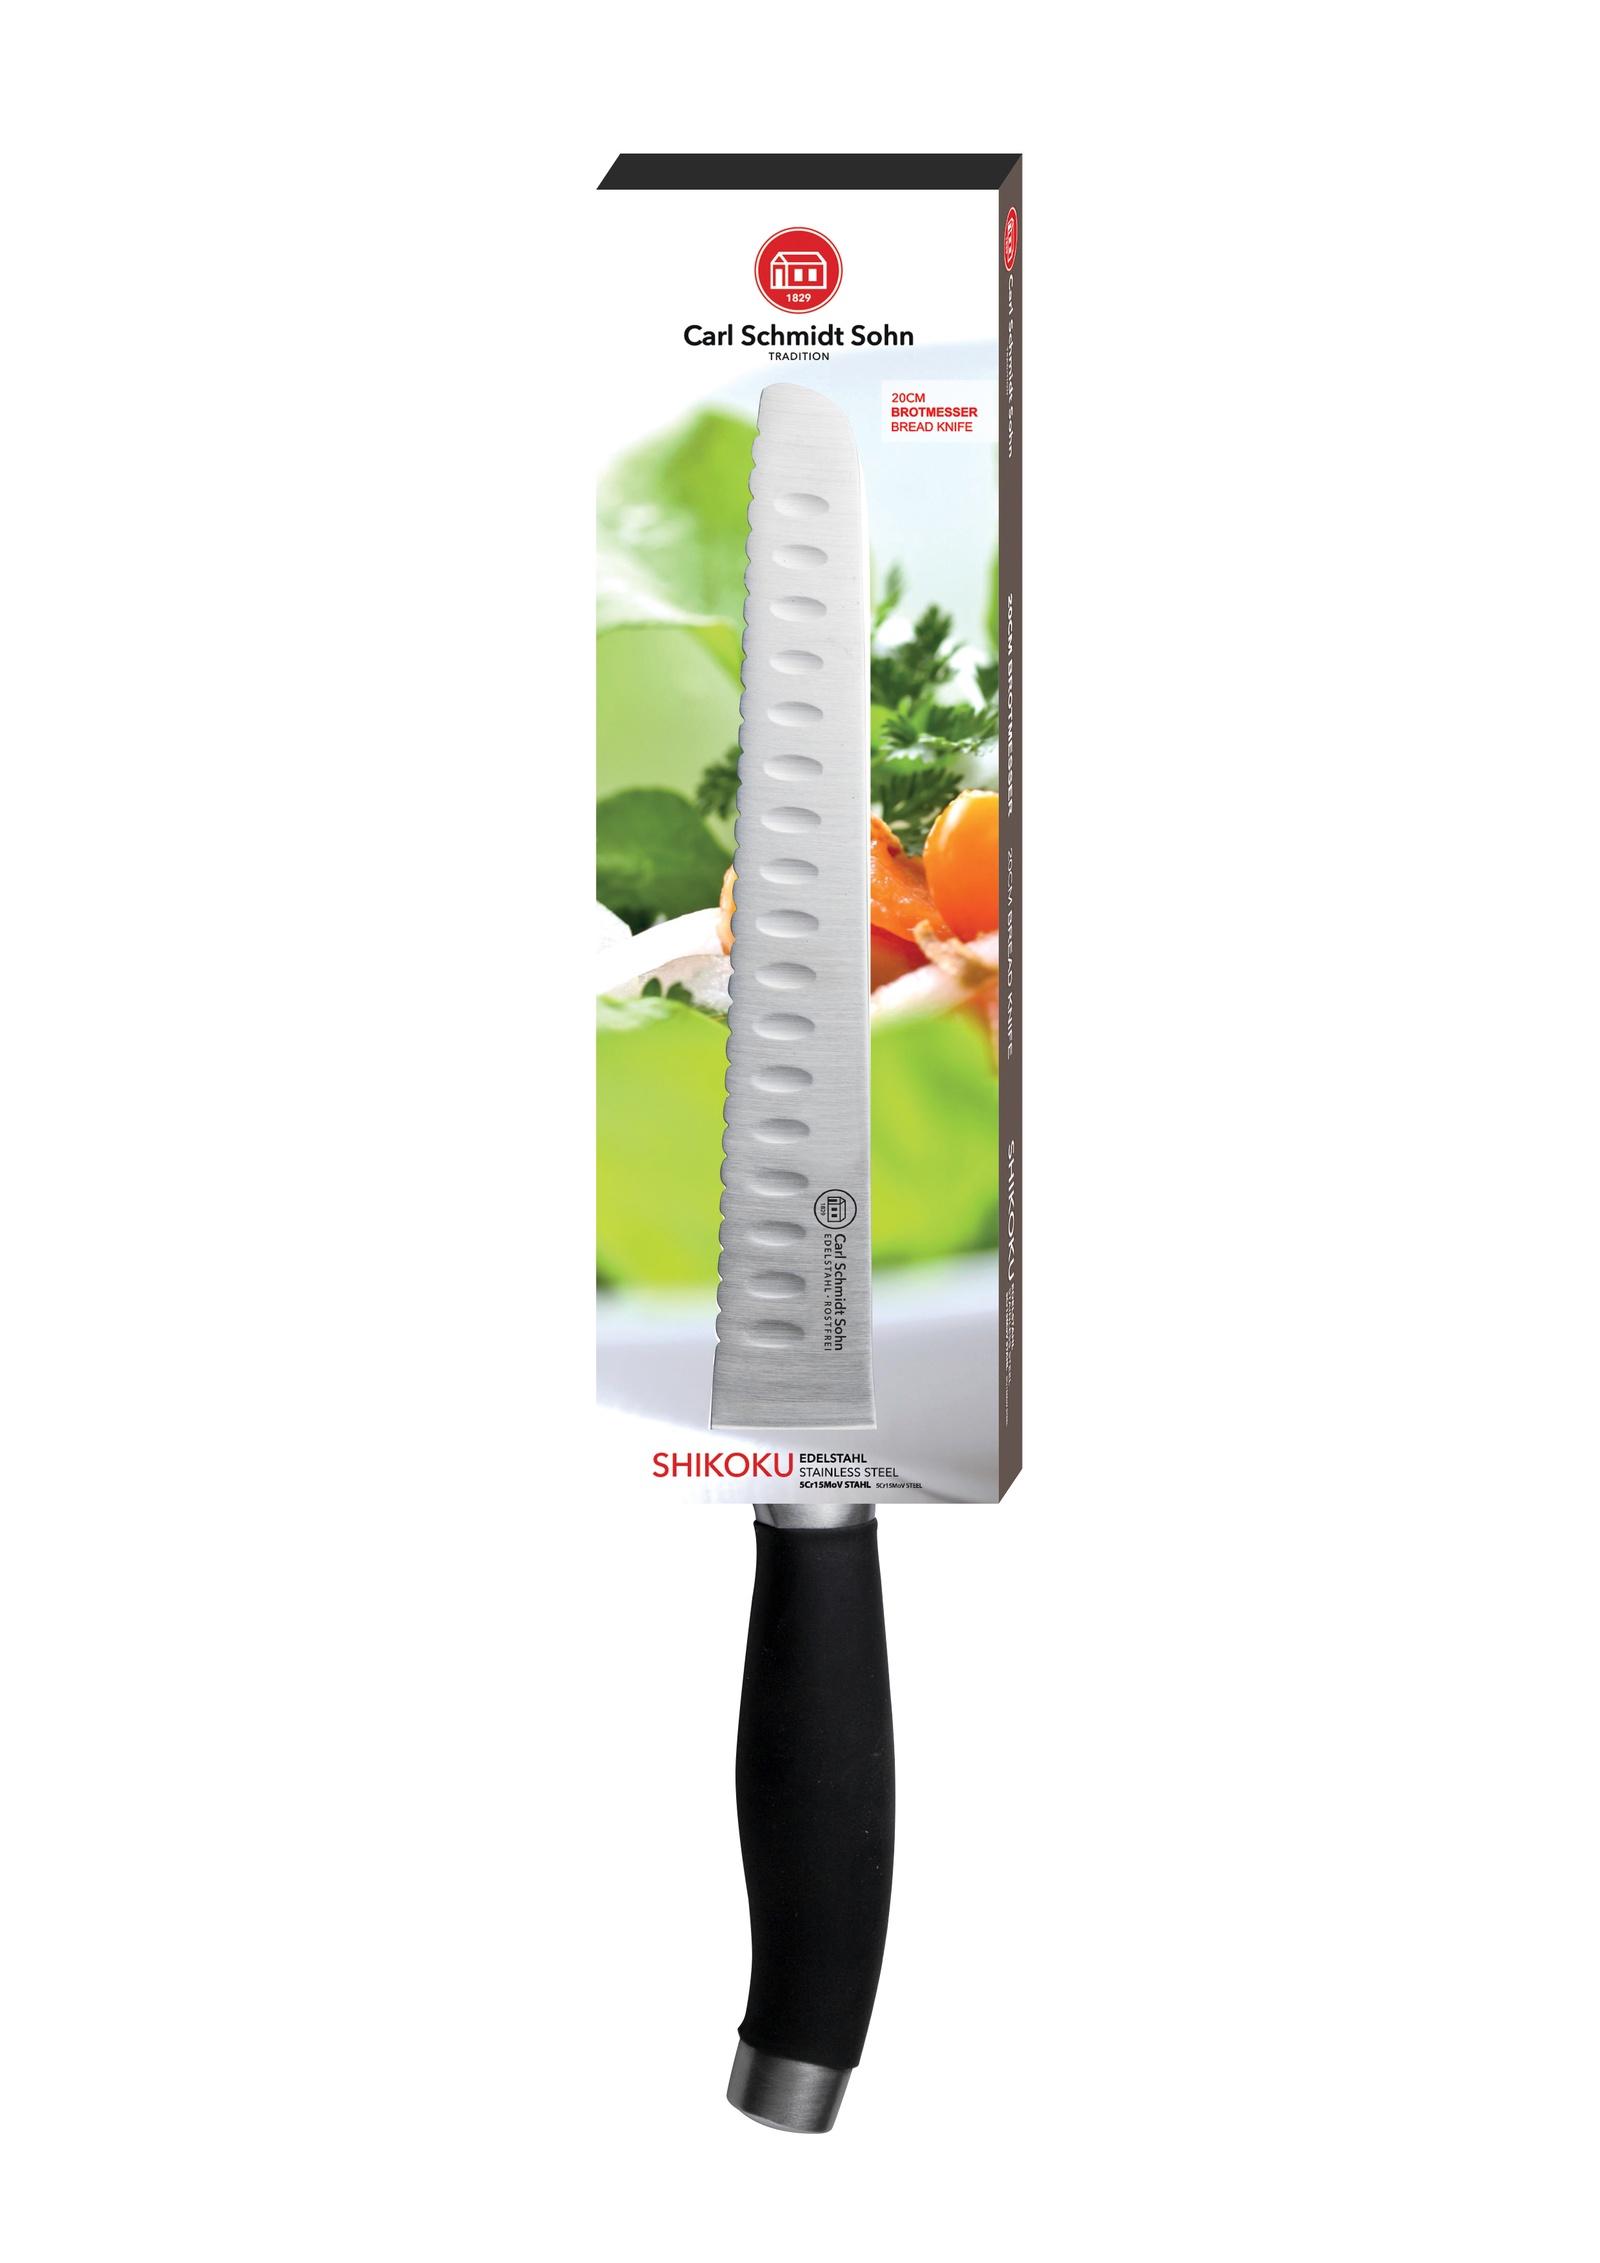 Кухонный нож CARL SCHMIDT SOHN CS020767, серебристый